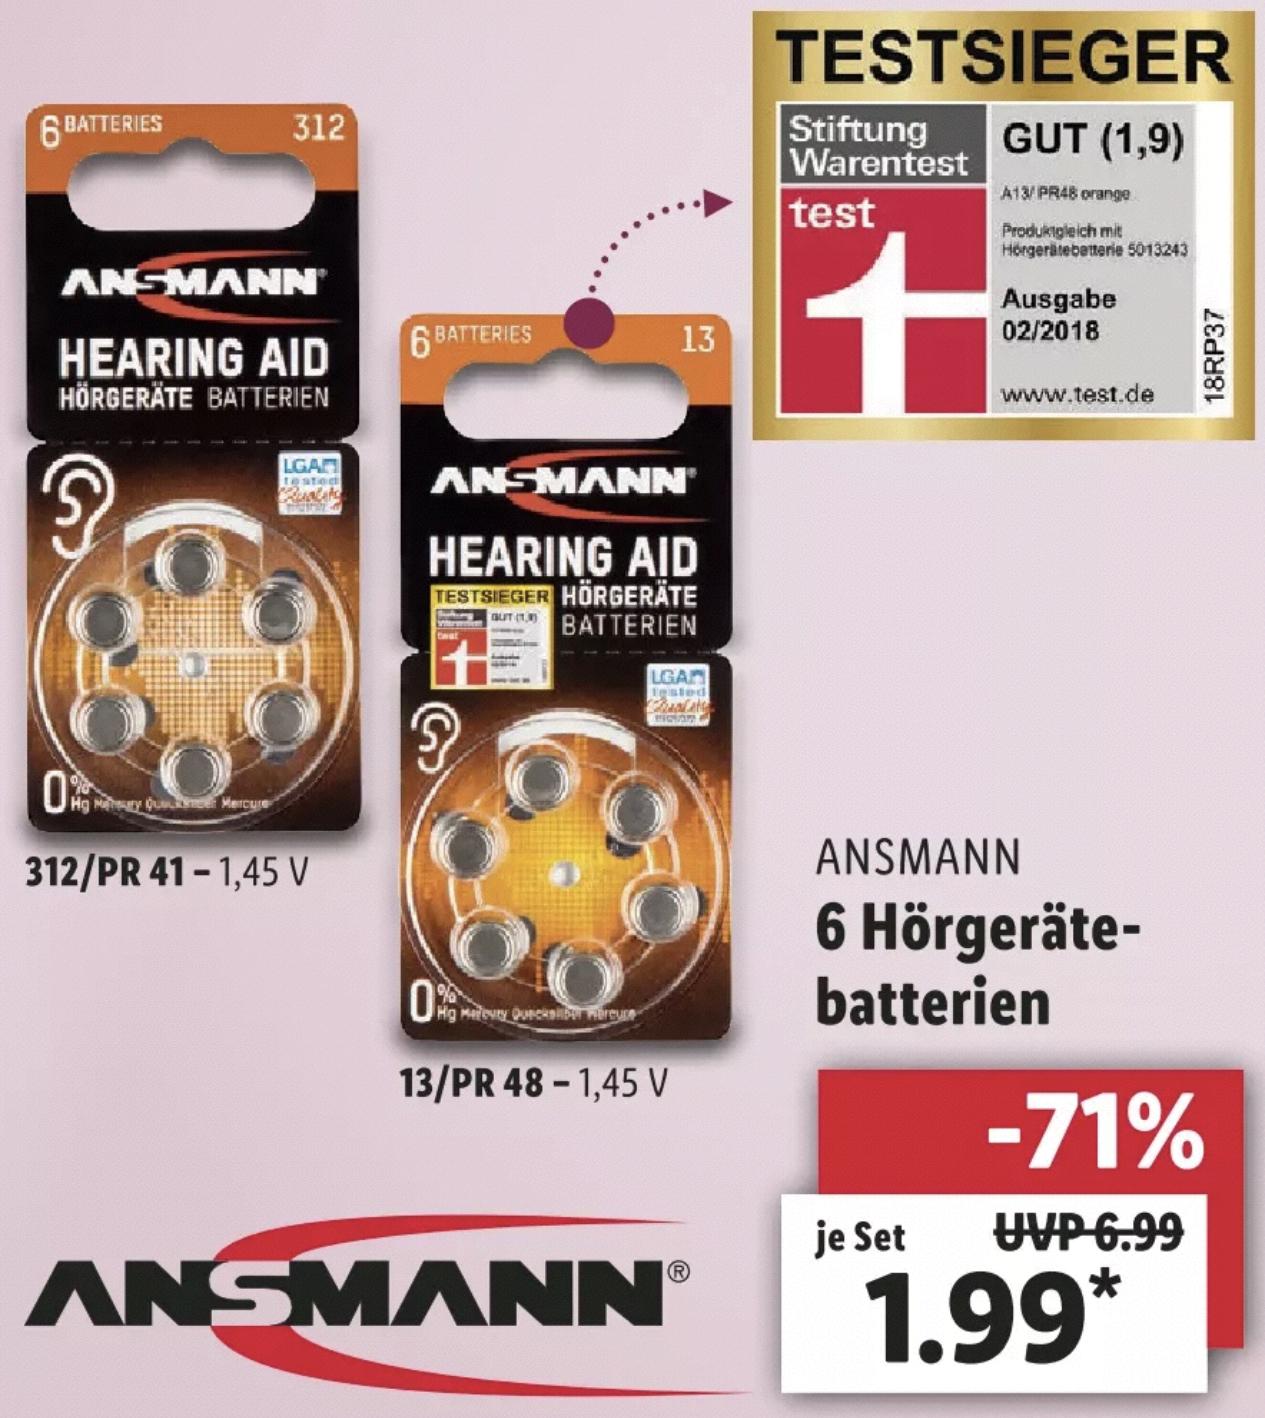 Lidl: Ansmann Hörgeräte Batterien 6 Stück PR41 o. PR48 je 1,99€ - ab 12.03.